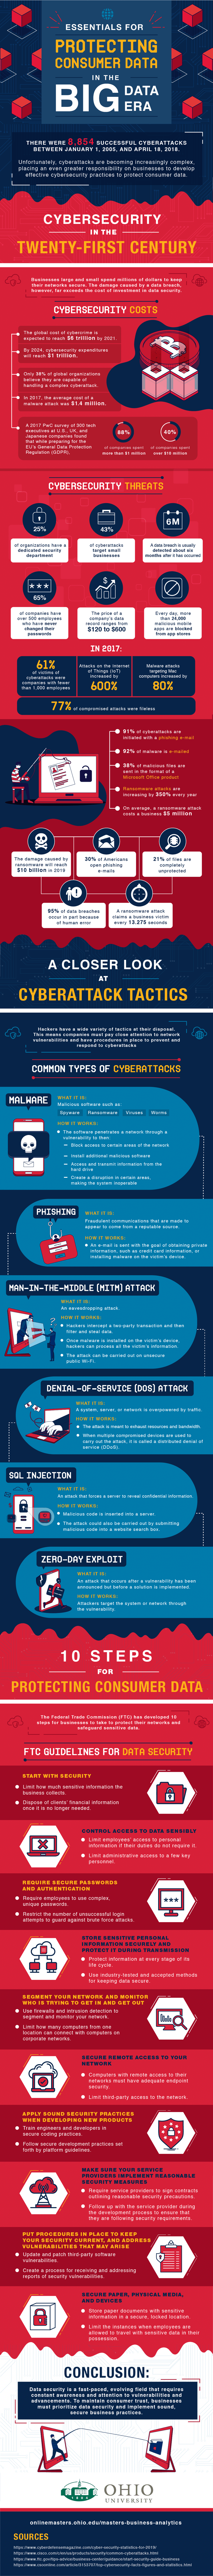 Protecting Consumer Data in the Big Data Era